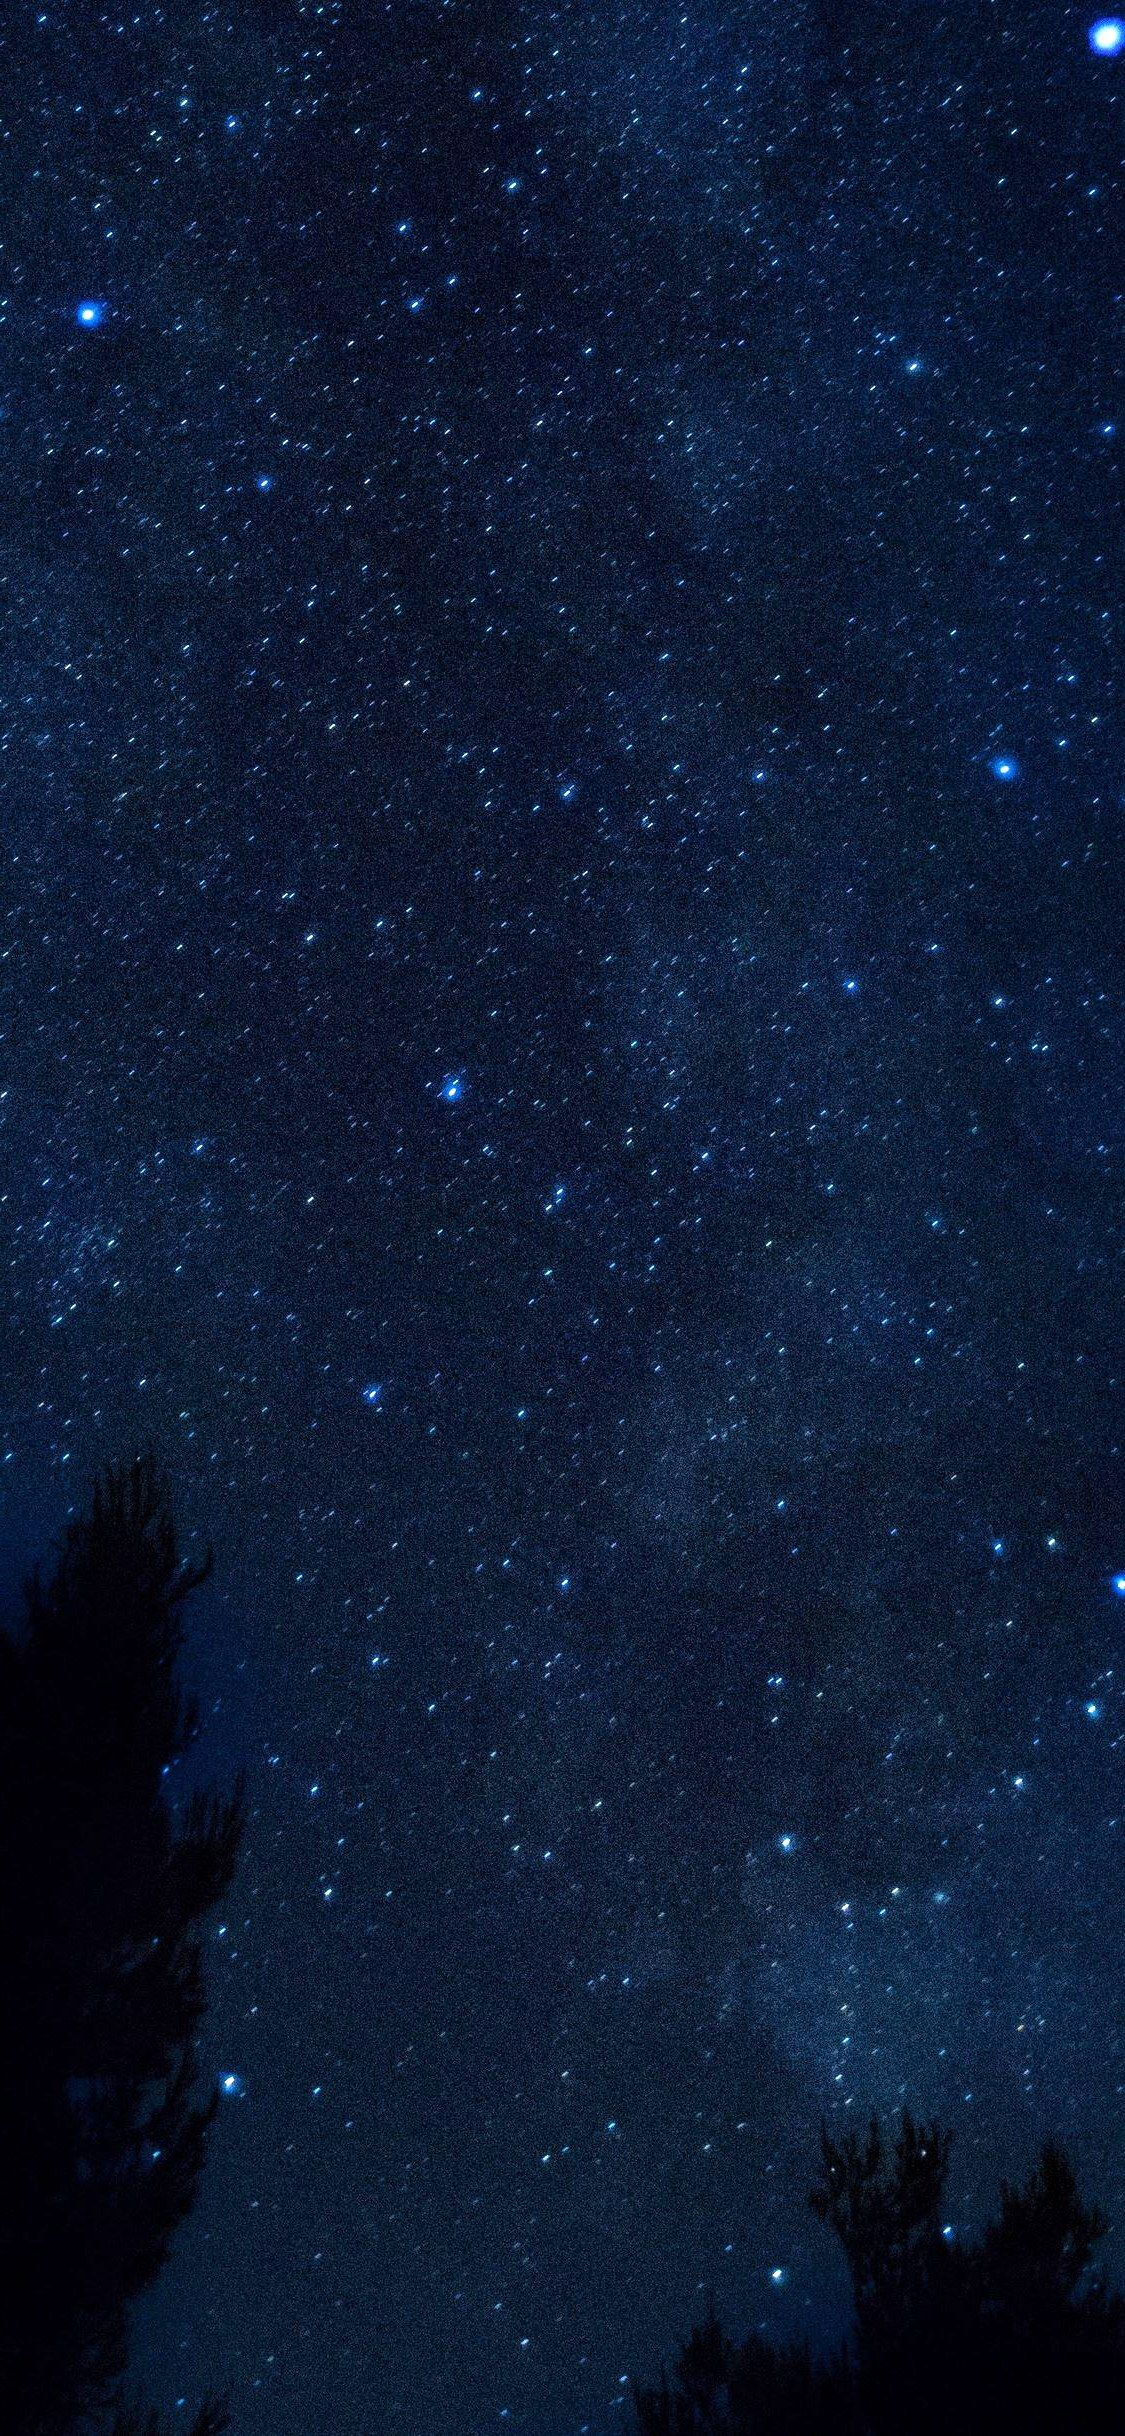 Iphone X Wallpaper Starry Sky Night Trees Hd In 2020 Wallpaper